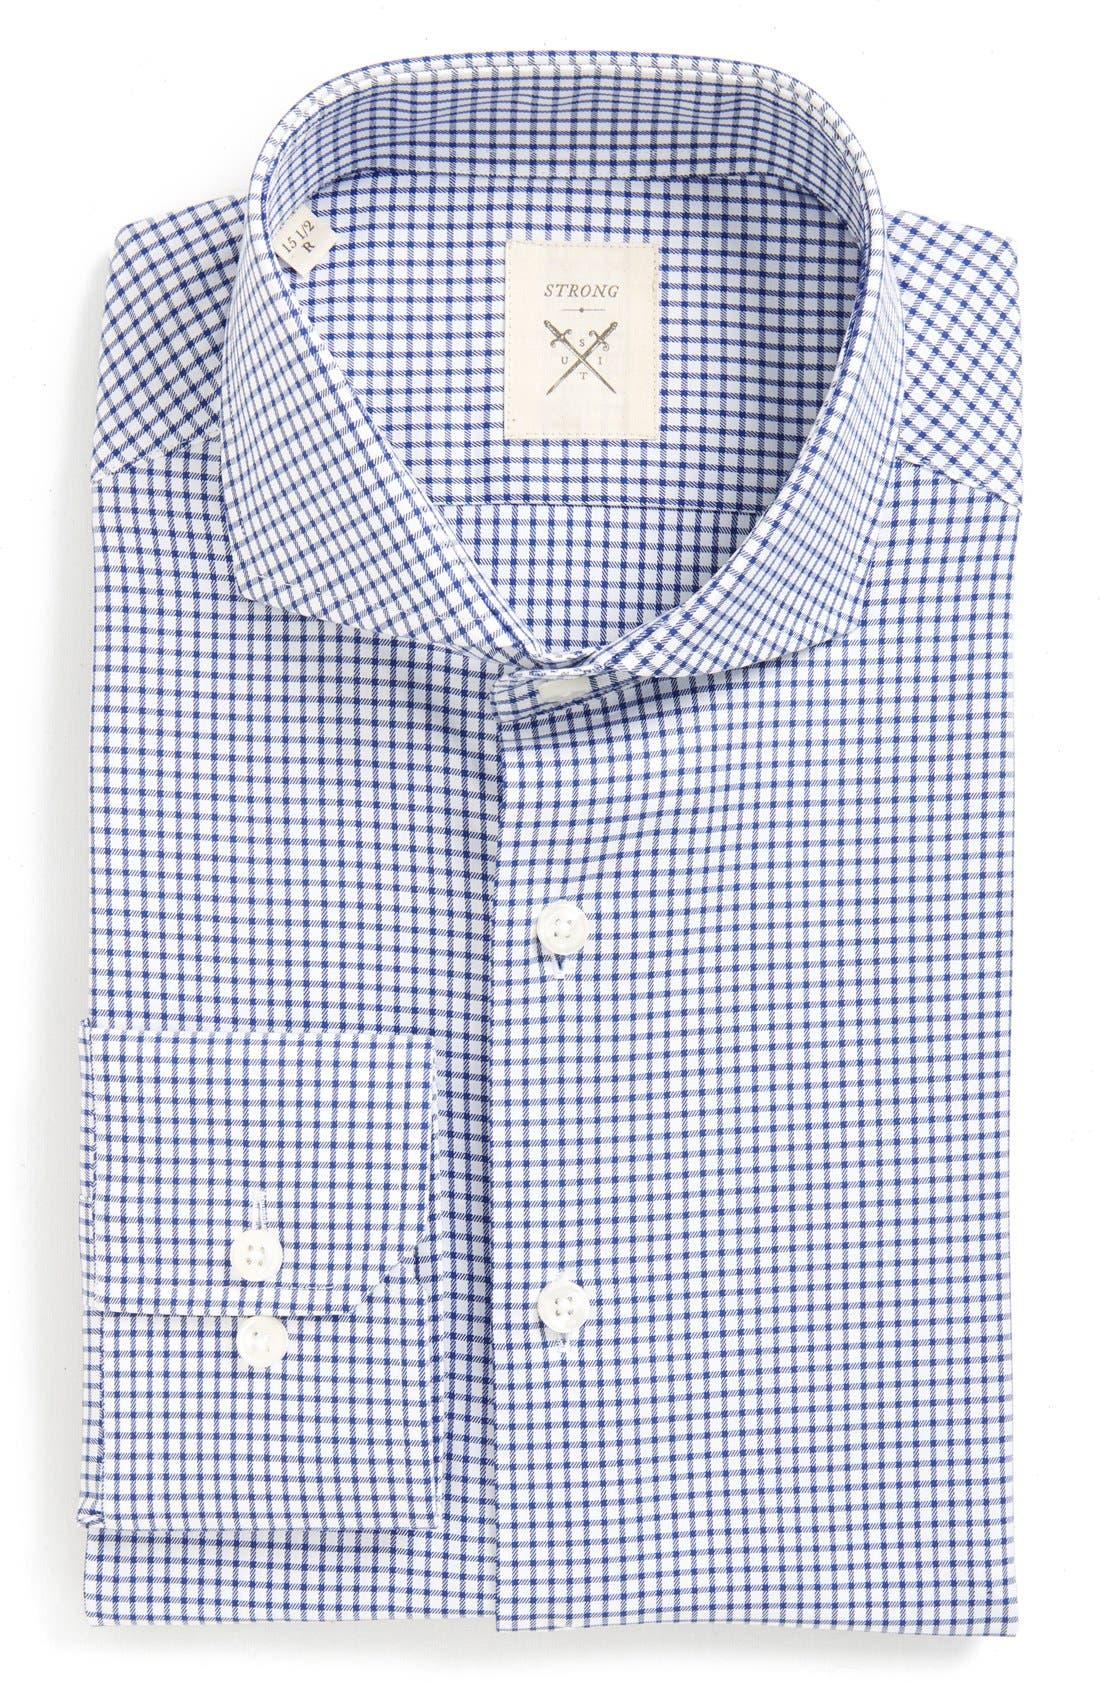 Strong Suit 'Espirit' Trim Fit Check Dress Shirt